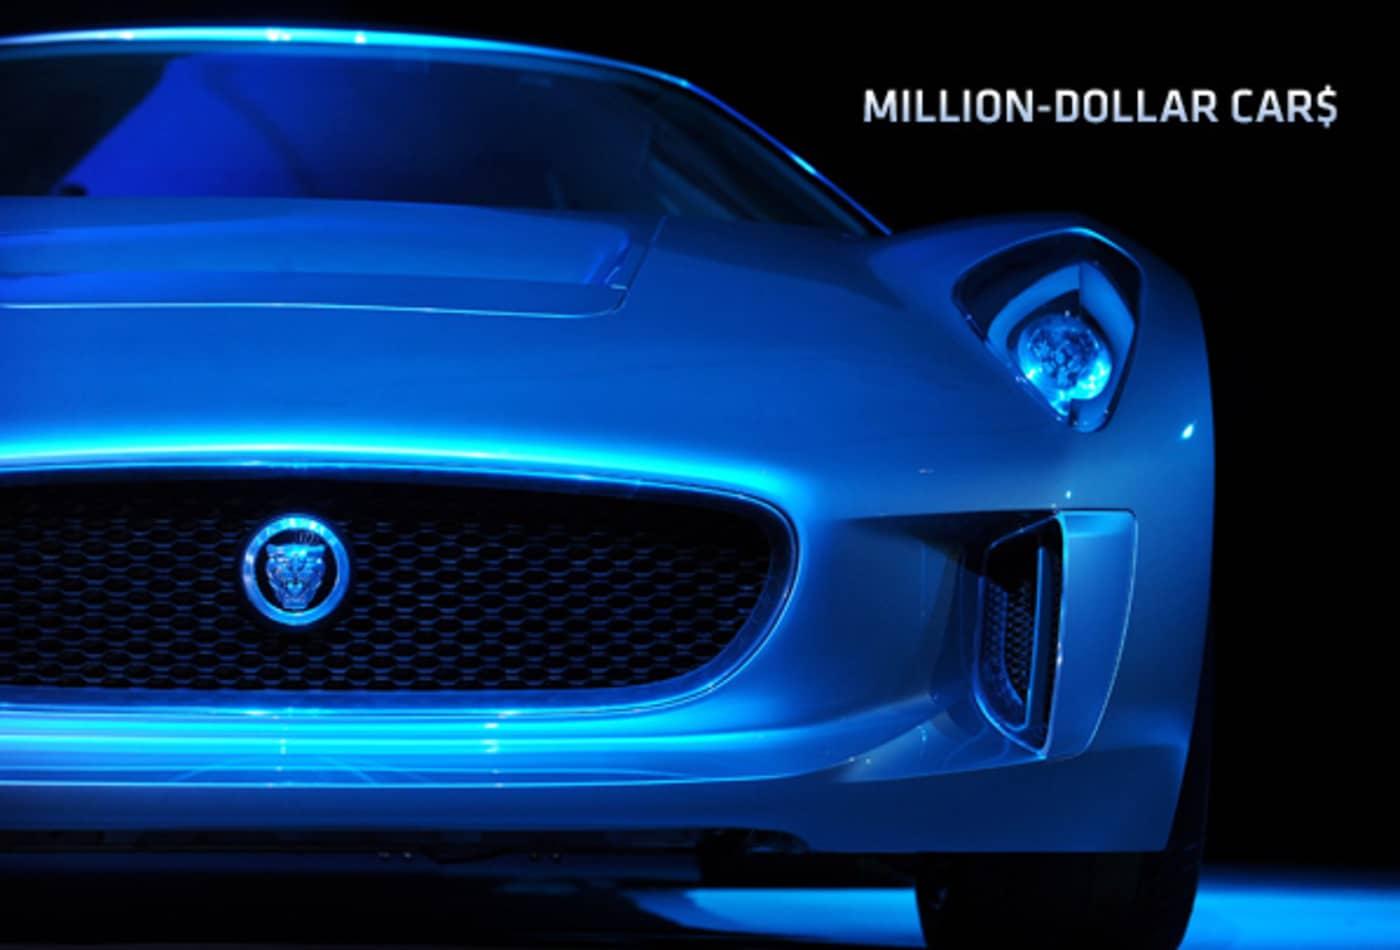 SS_MillionDollar_Cars.jpg